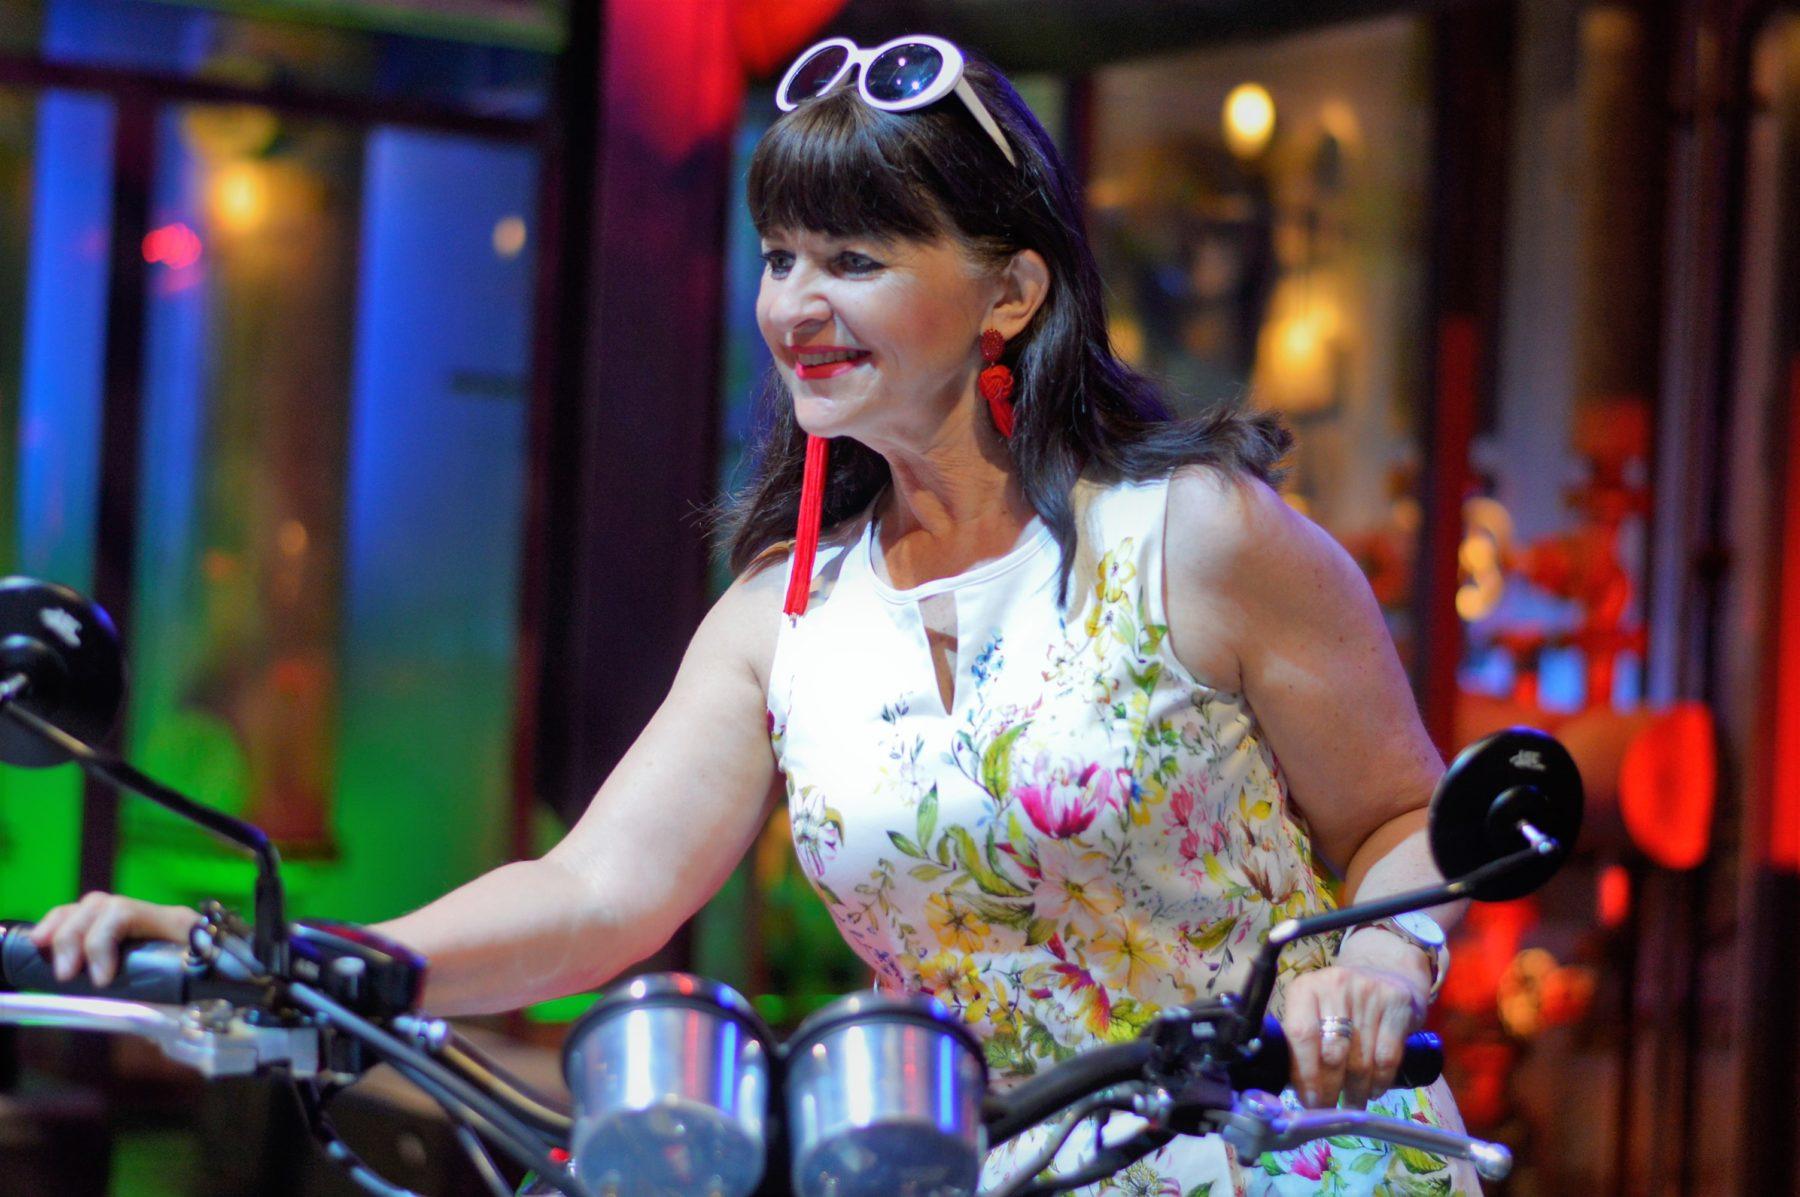 Sommerkleid mit Motorrad